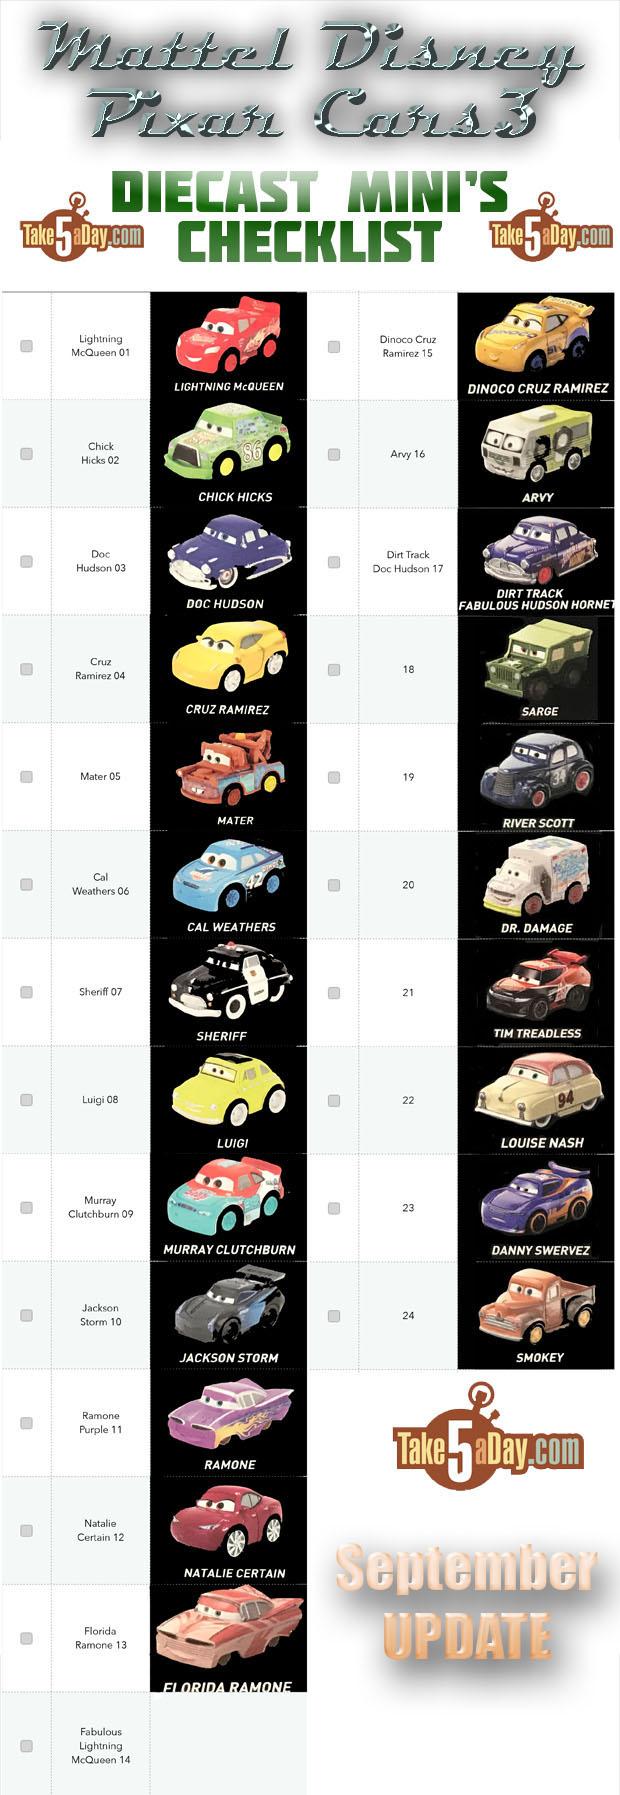 Disney Pixar Cars  Blu Ray